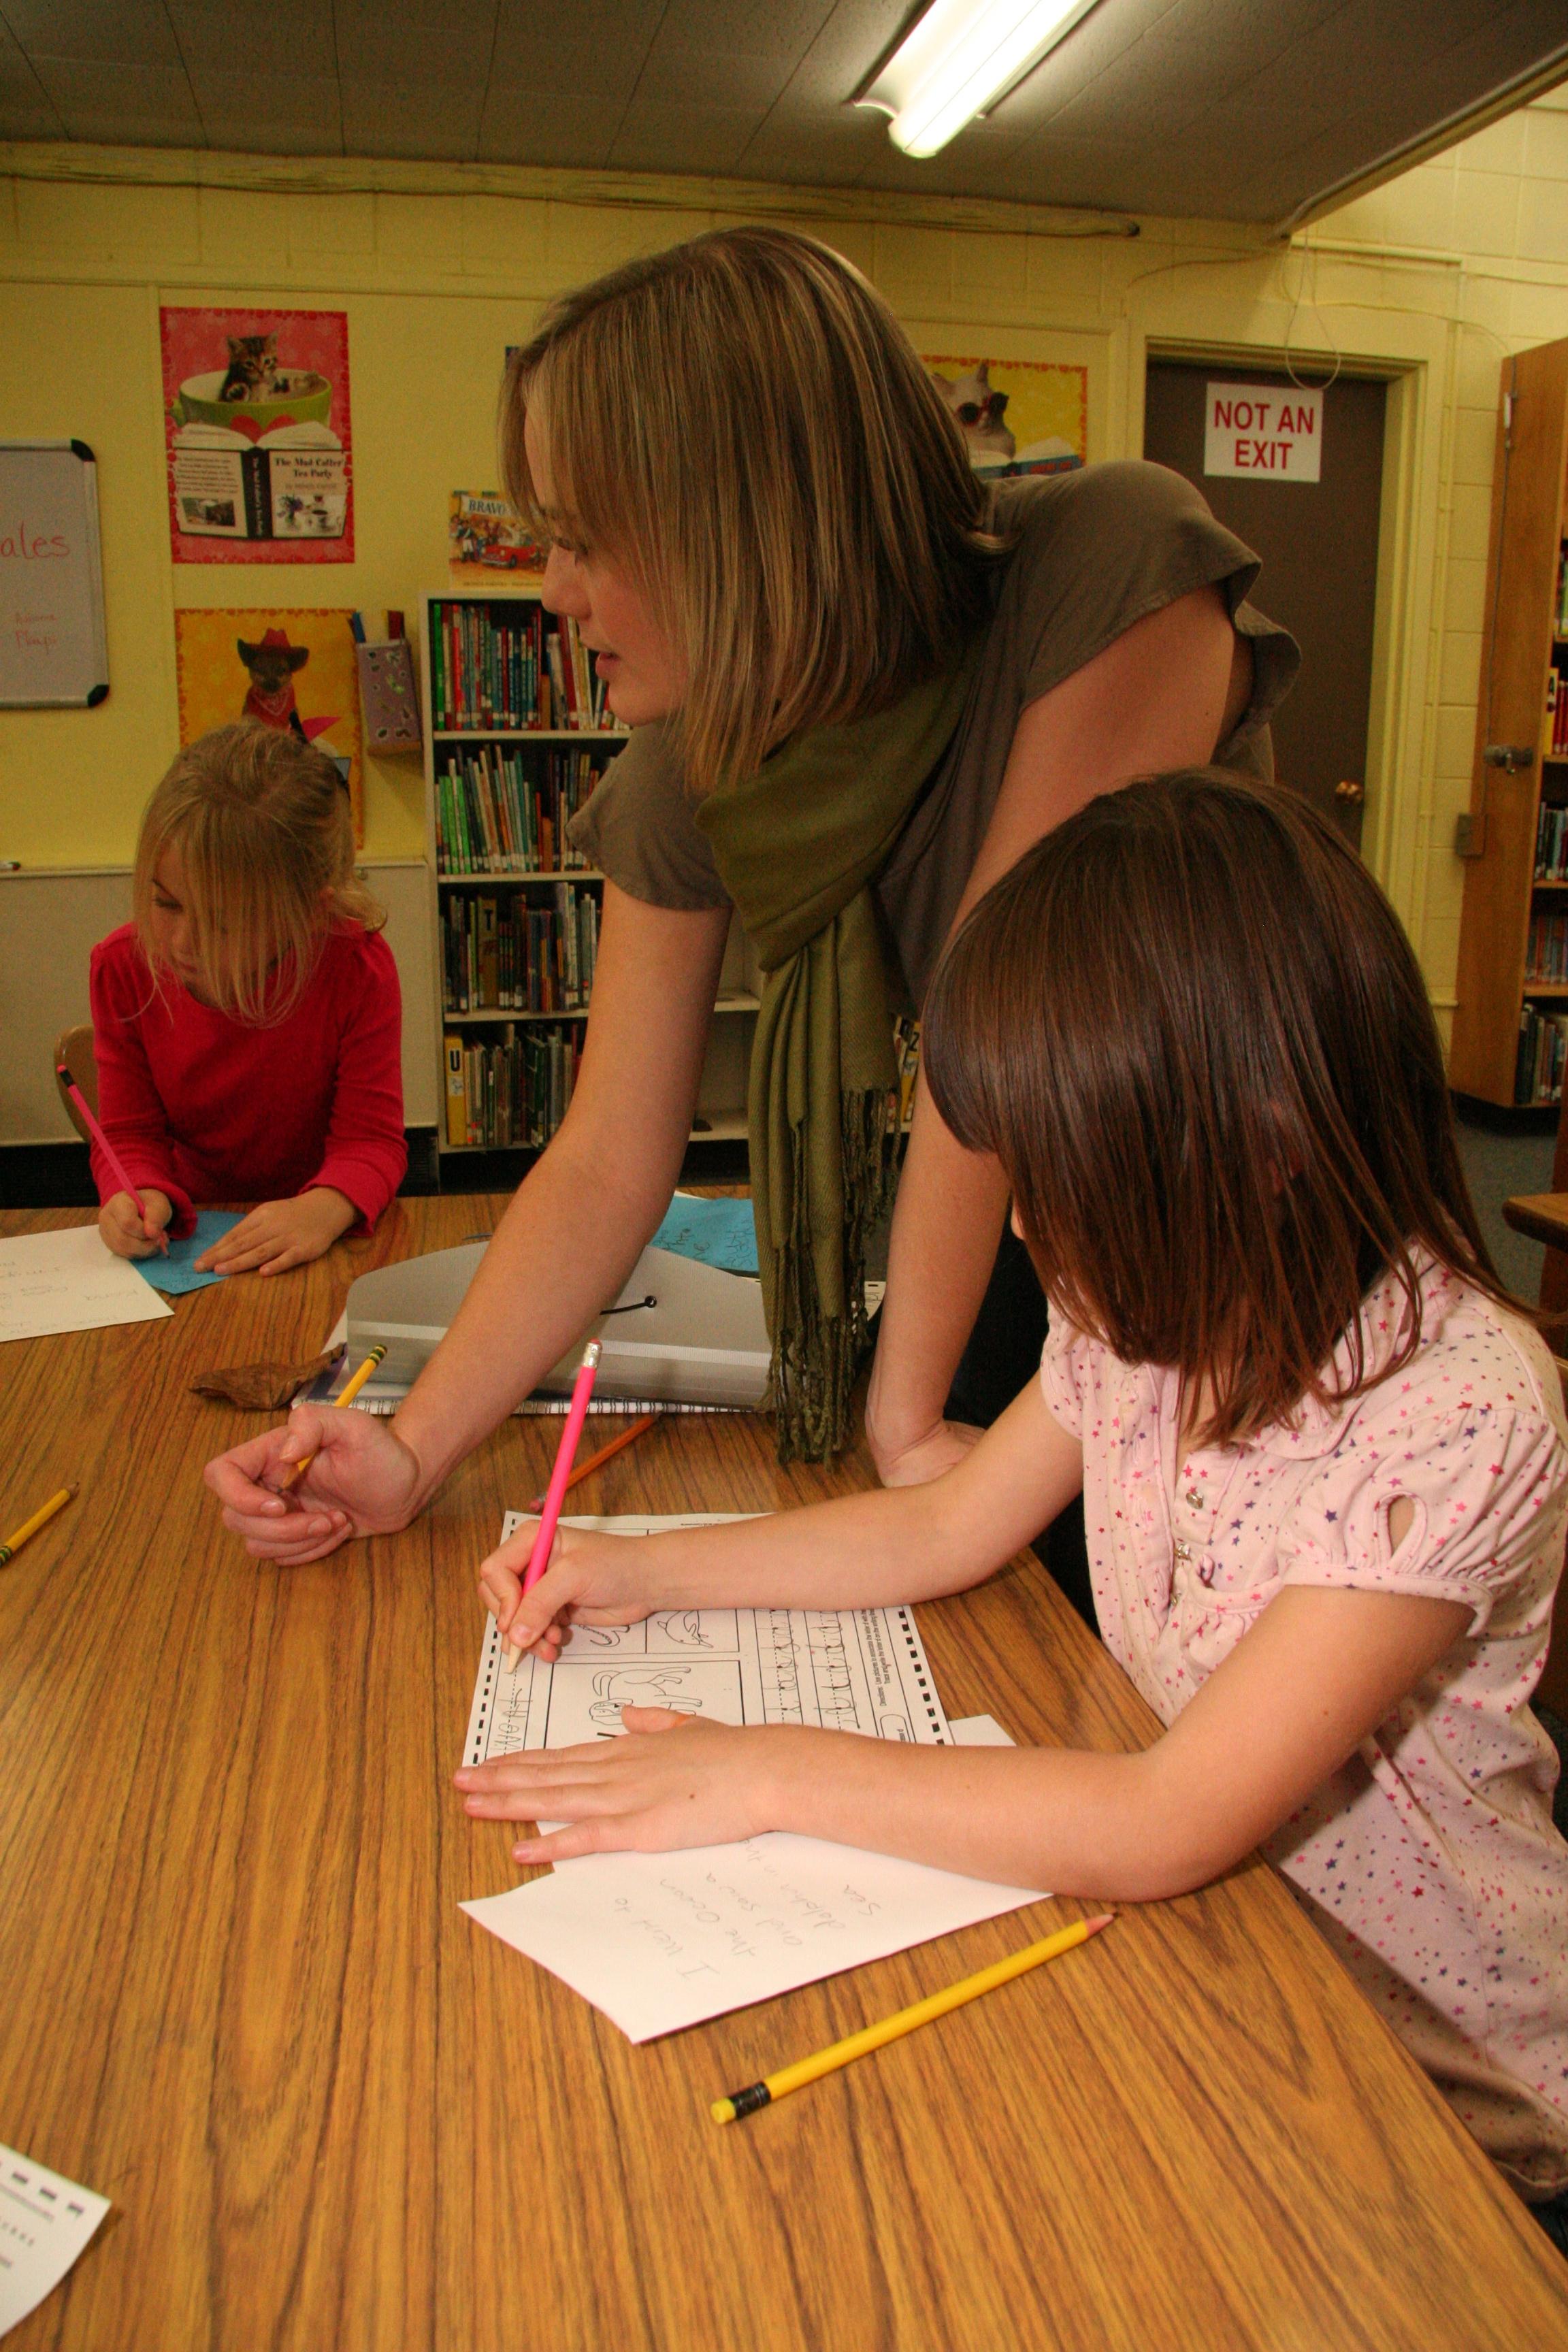 Korrin Volunteering in a Eugene classroom during her undergraduate studies.